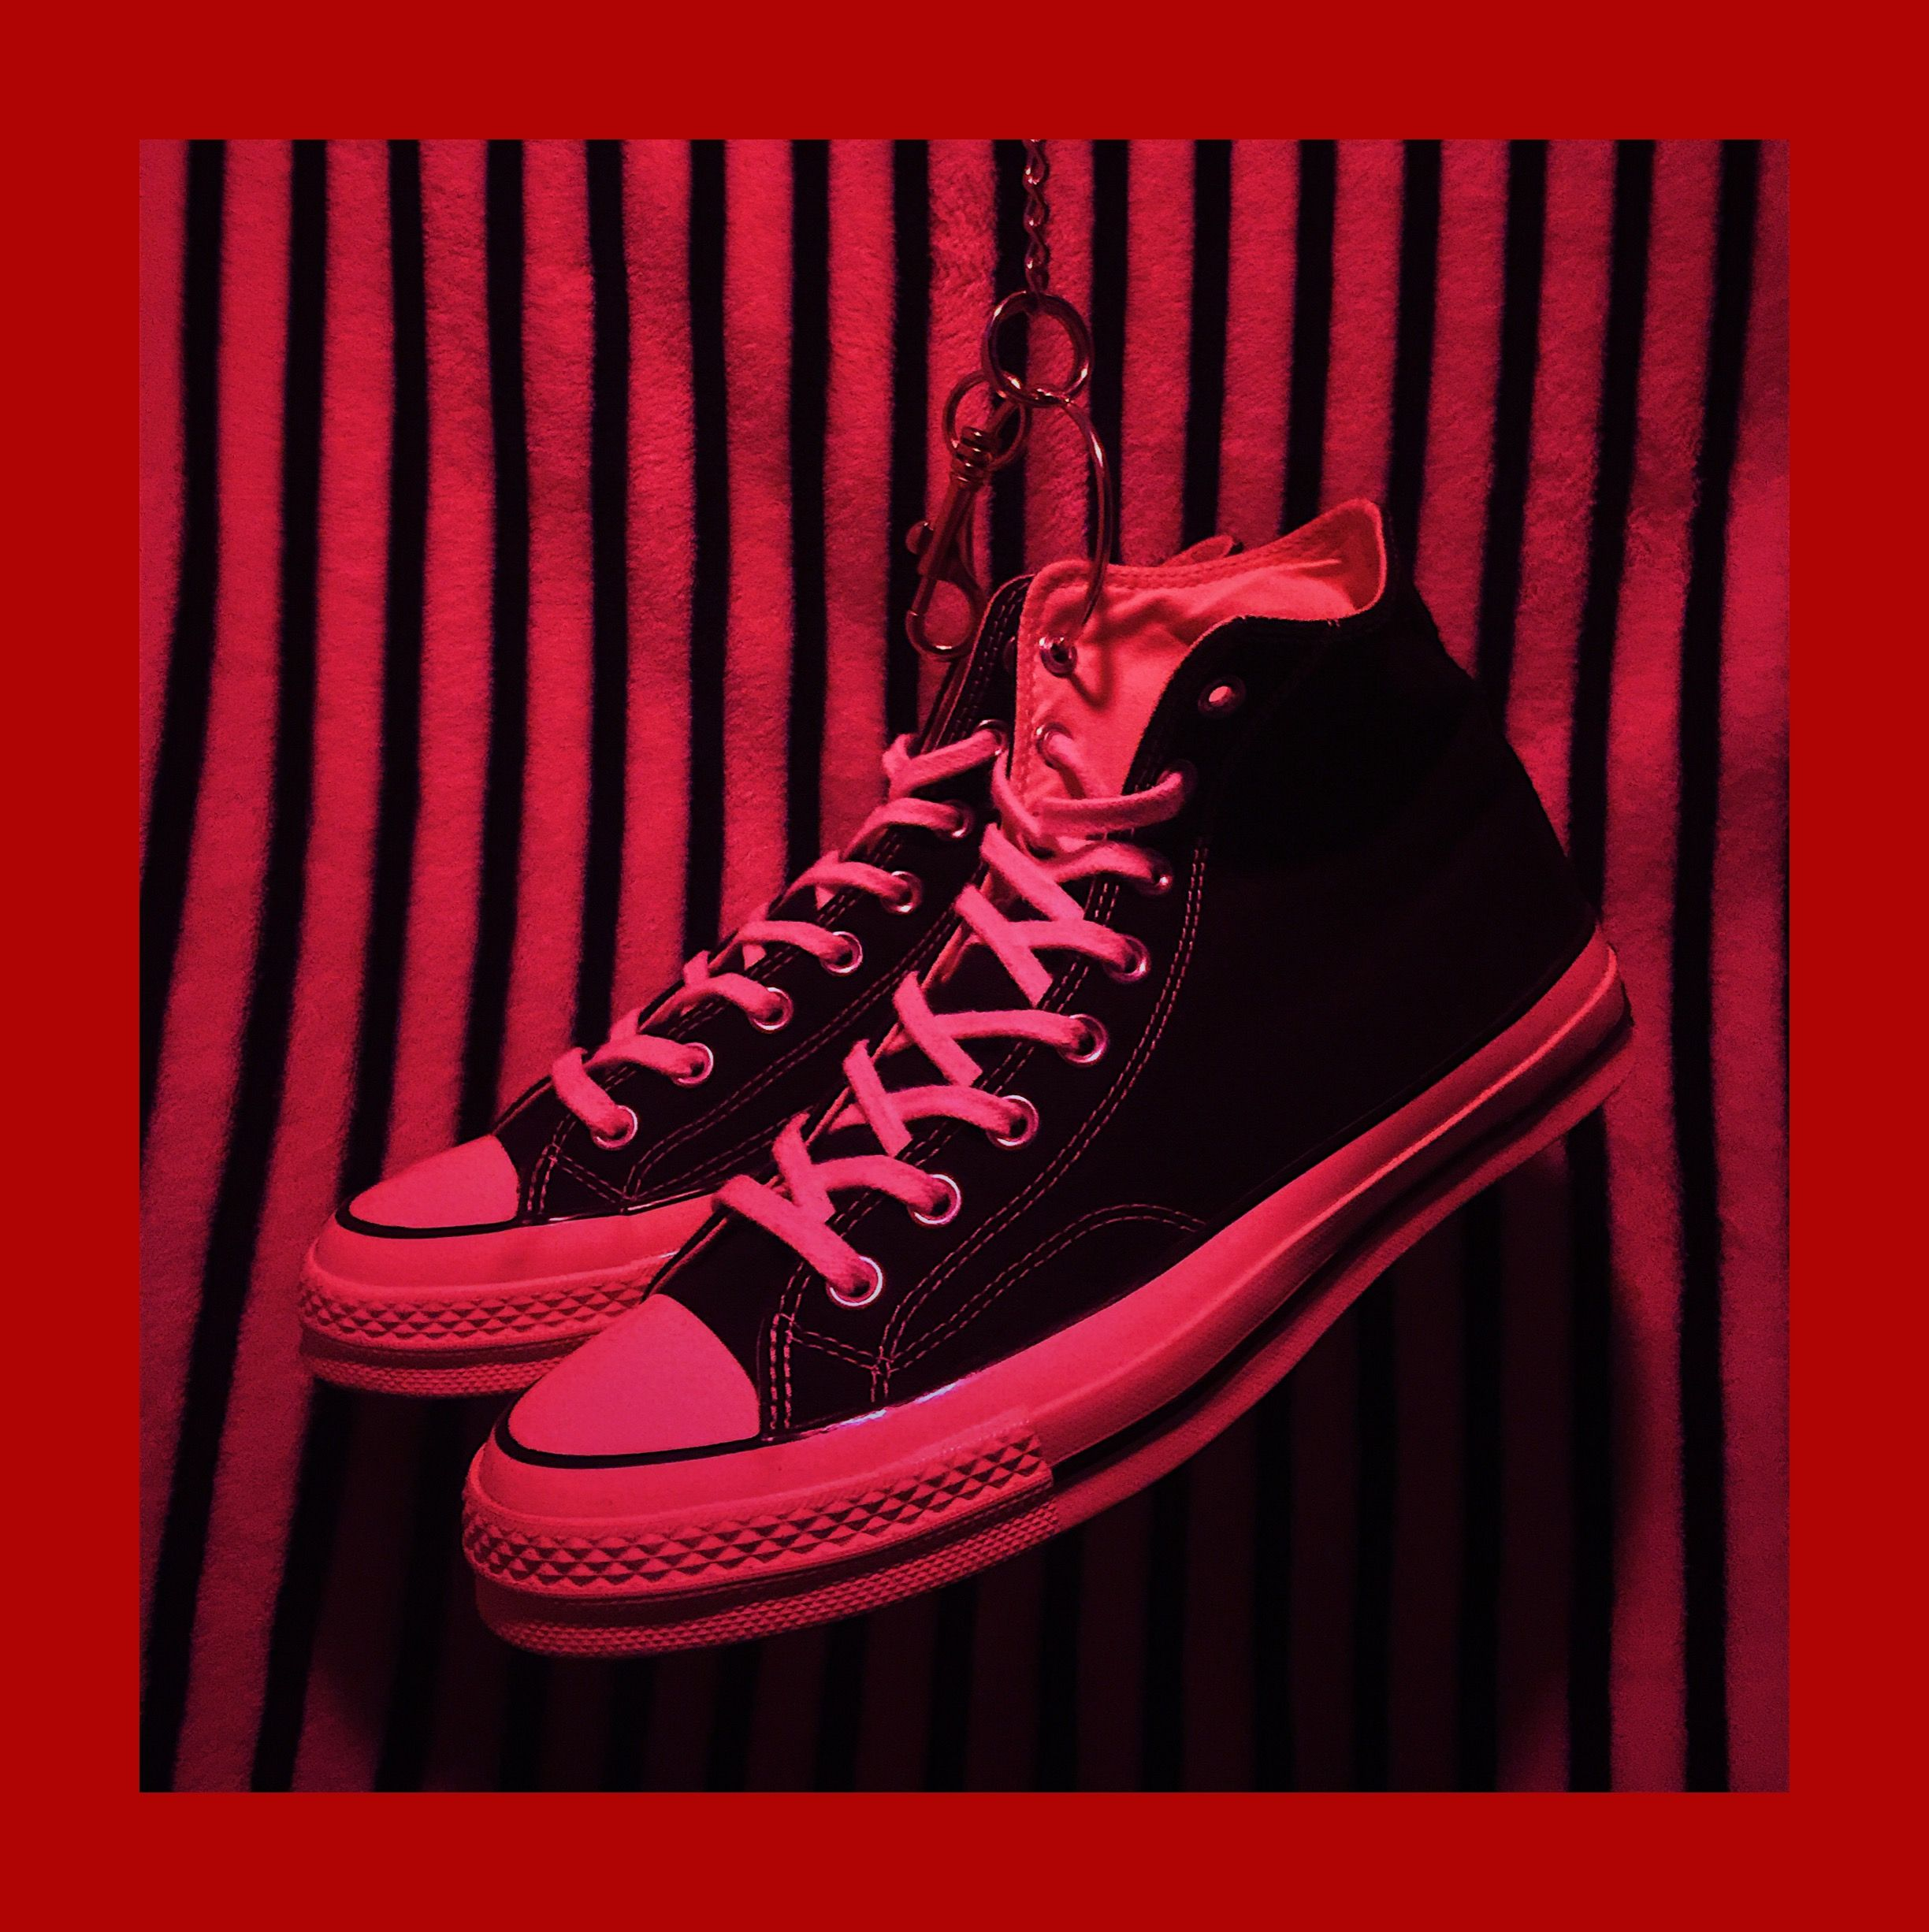 ig   chancelajes Classic Converse Chuck Taylor All Star 70s.  aesthetic   hypebeast  vintagefashion  streetstyle  streetwear  converse  minimal   oldschool 362b19b01